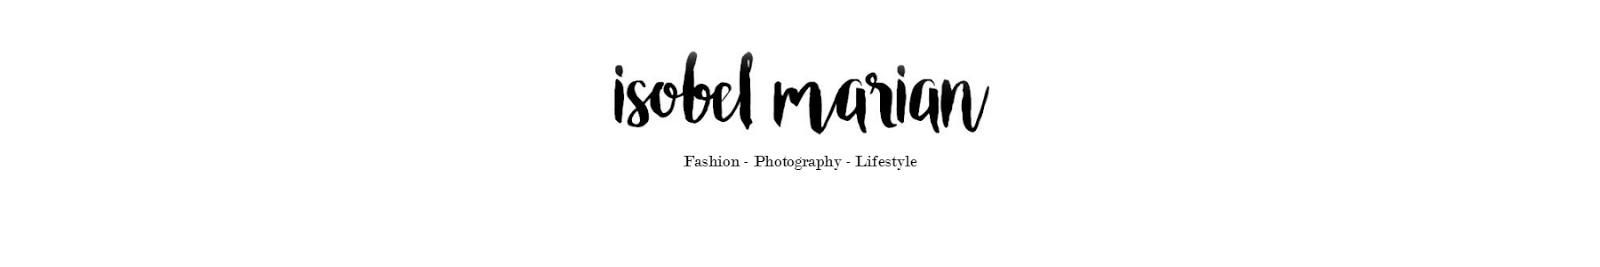 ISOBEL MARIAN